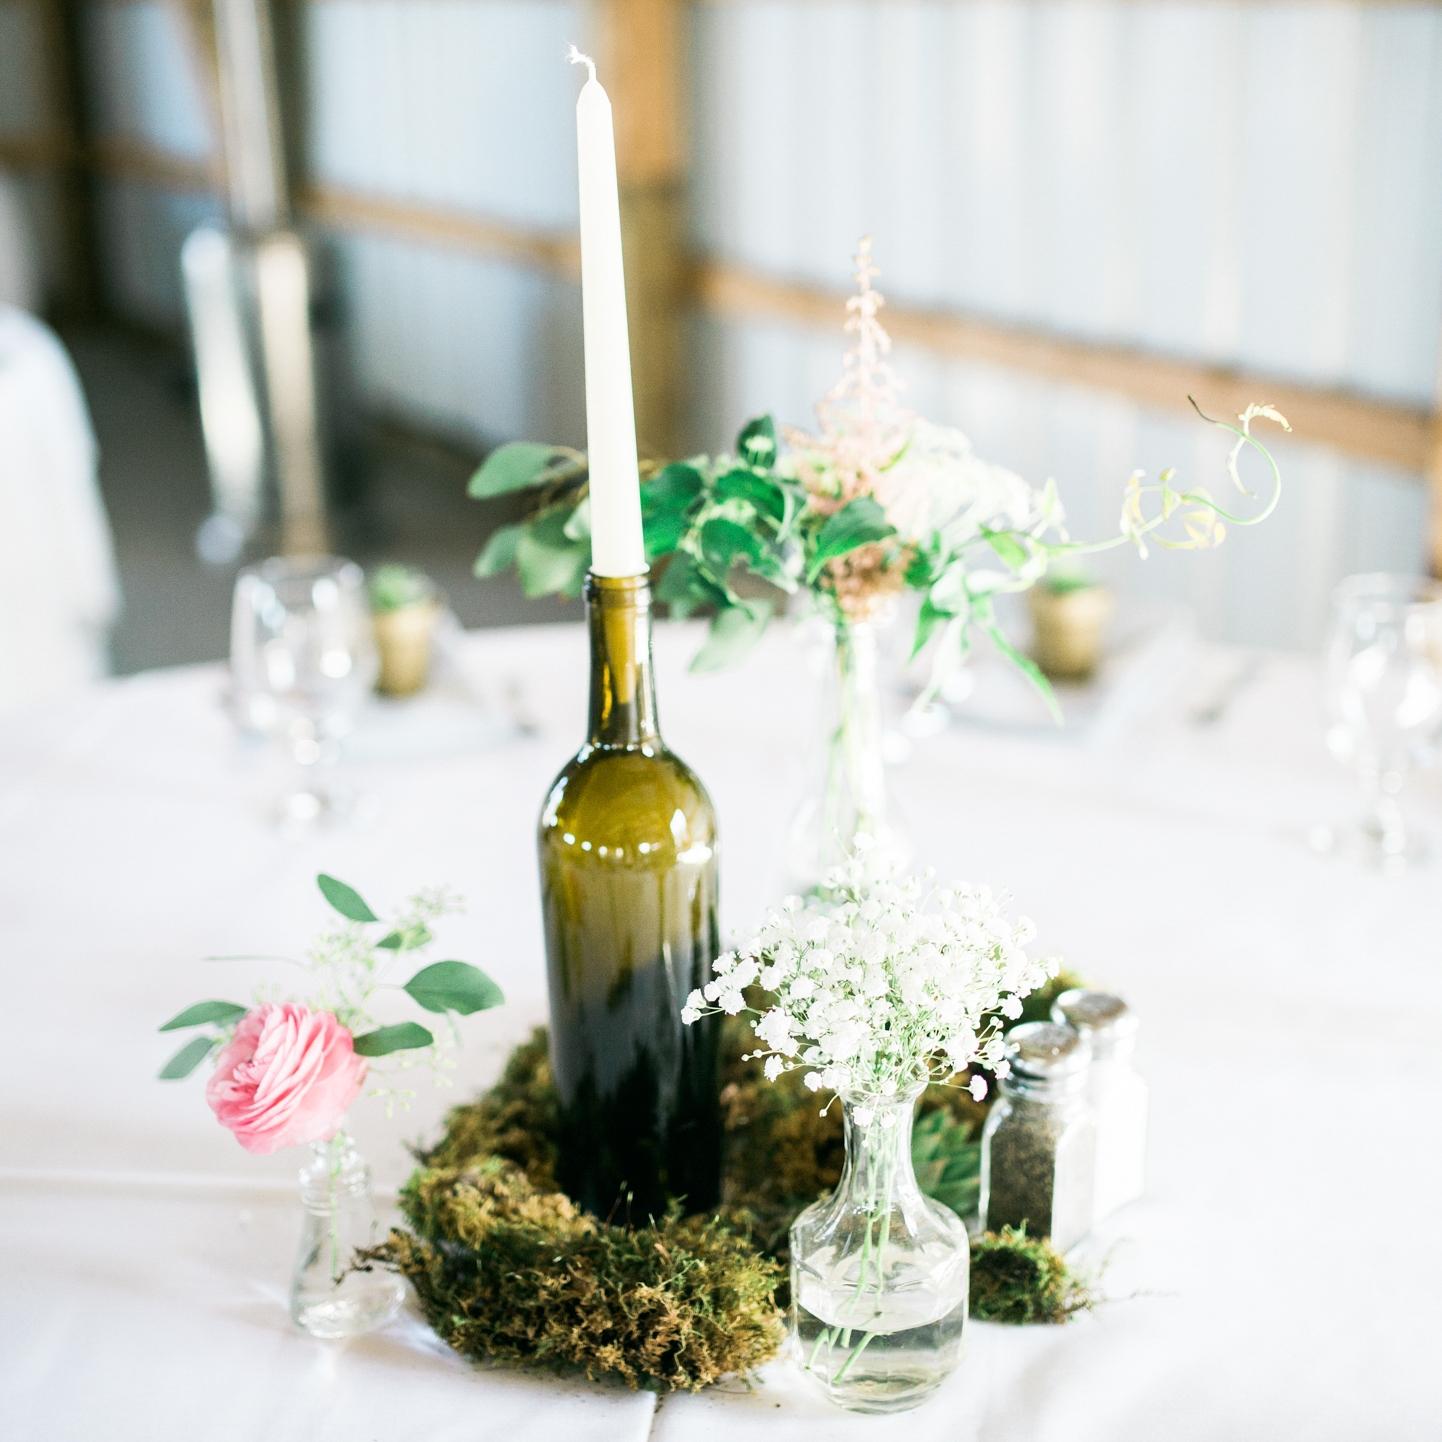 wine bottle candlesticks